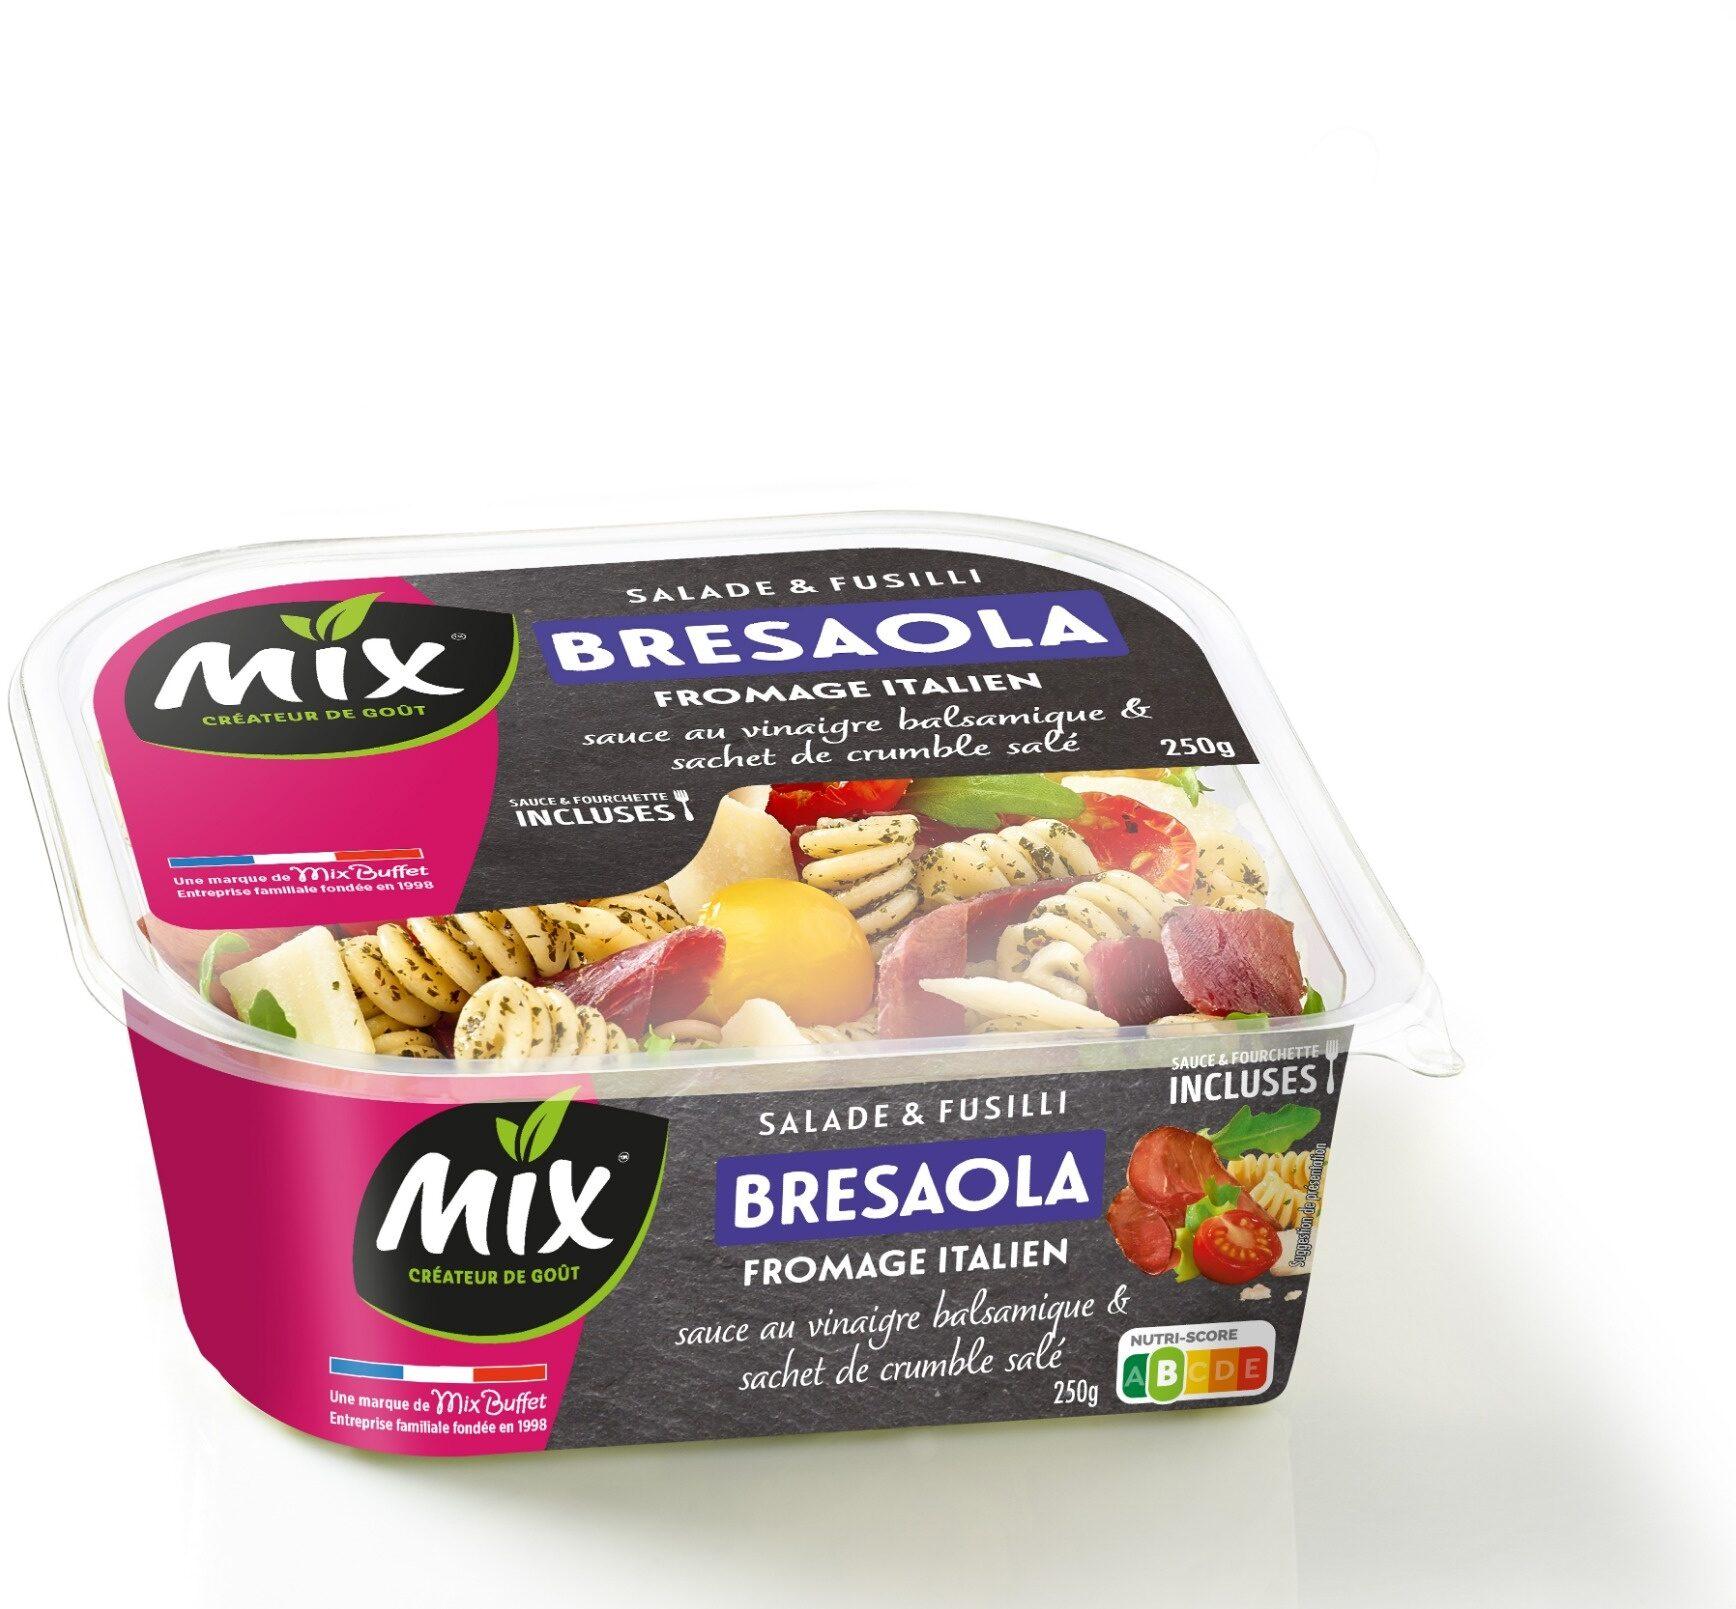 Salade & Fusilli Bresaola Fromage Italien, 250g - Produit - fr